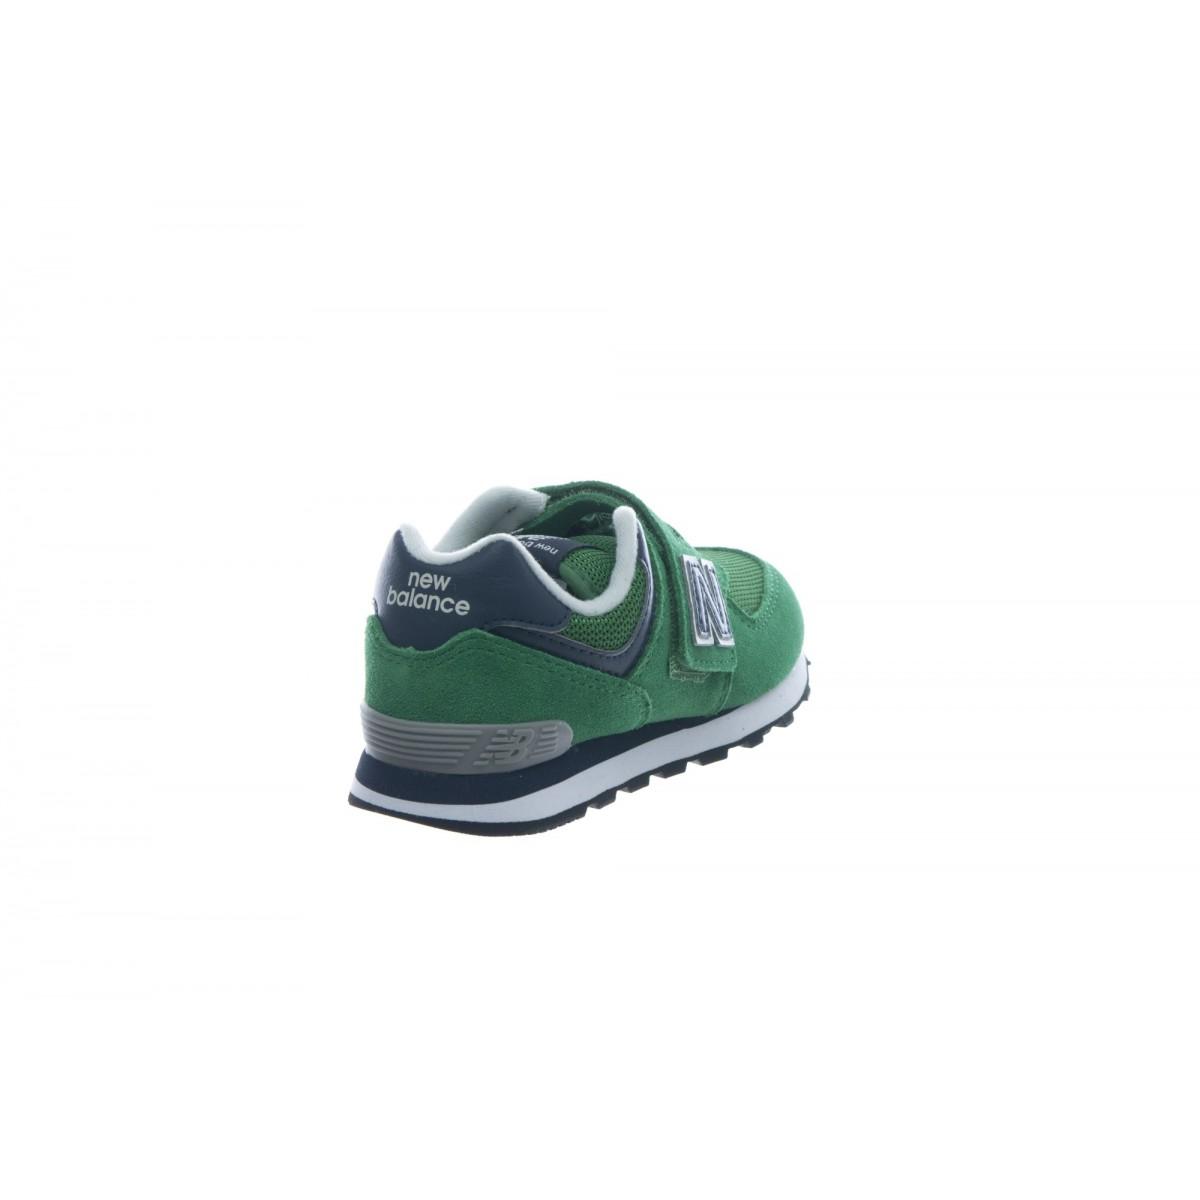 Scarpe - Yv574 preschool bambino